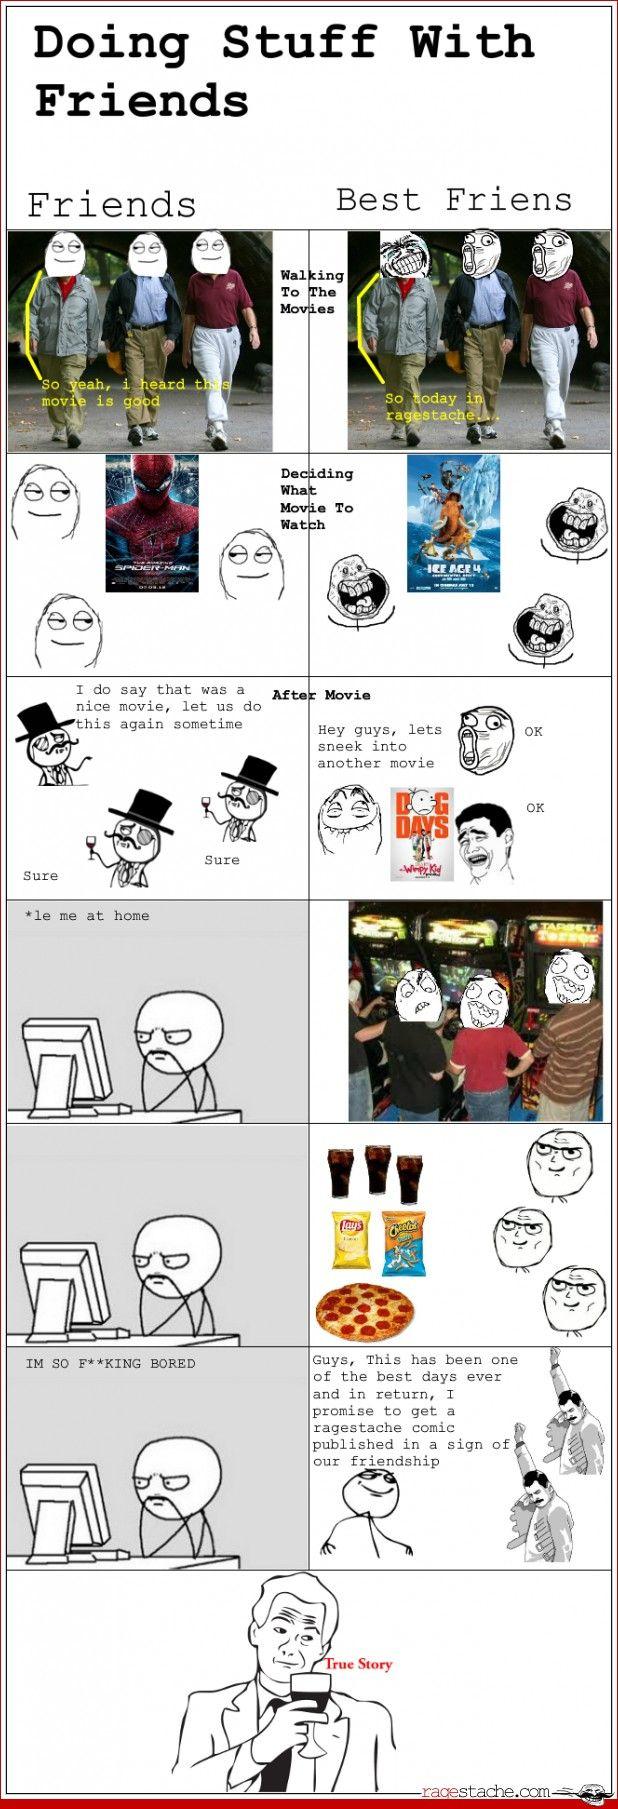 Doing stuff with friends vs best friends